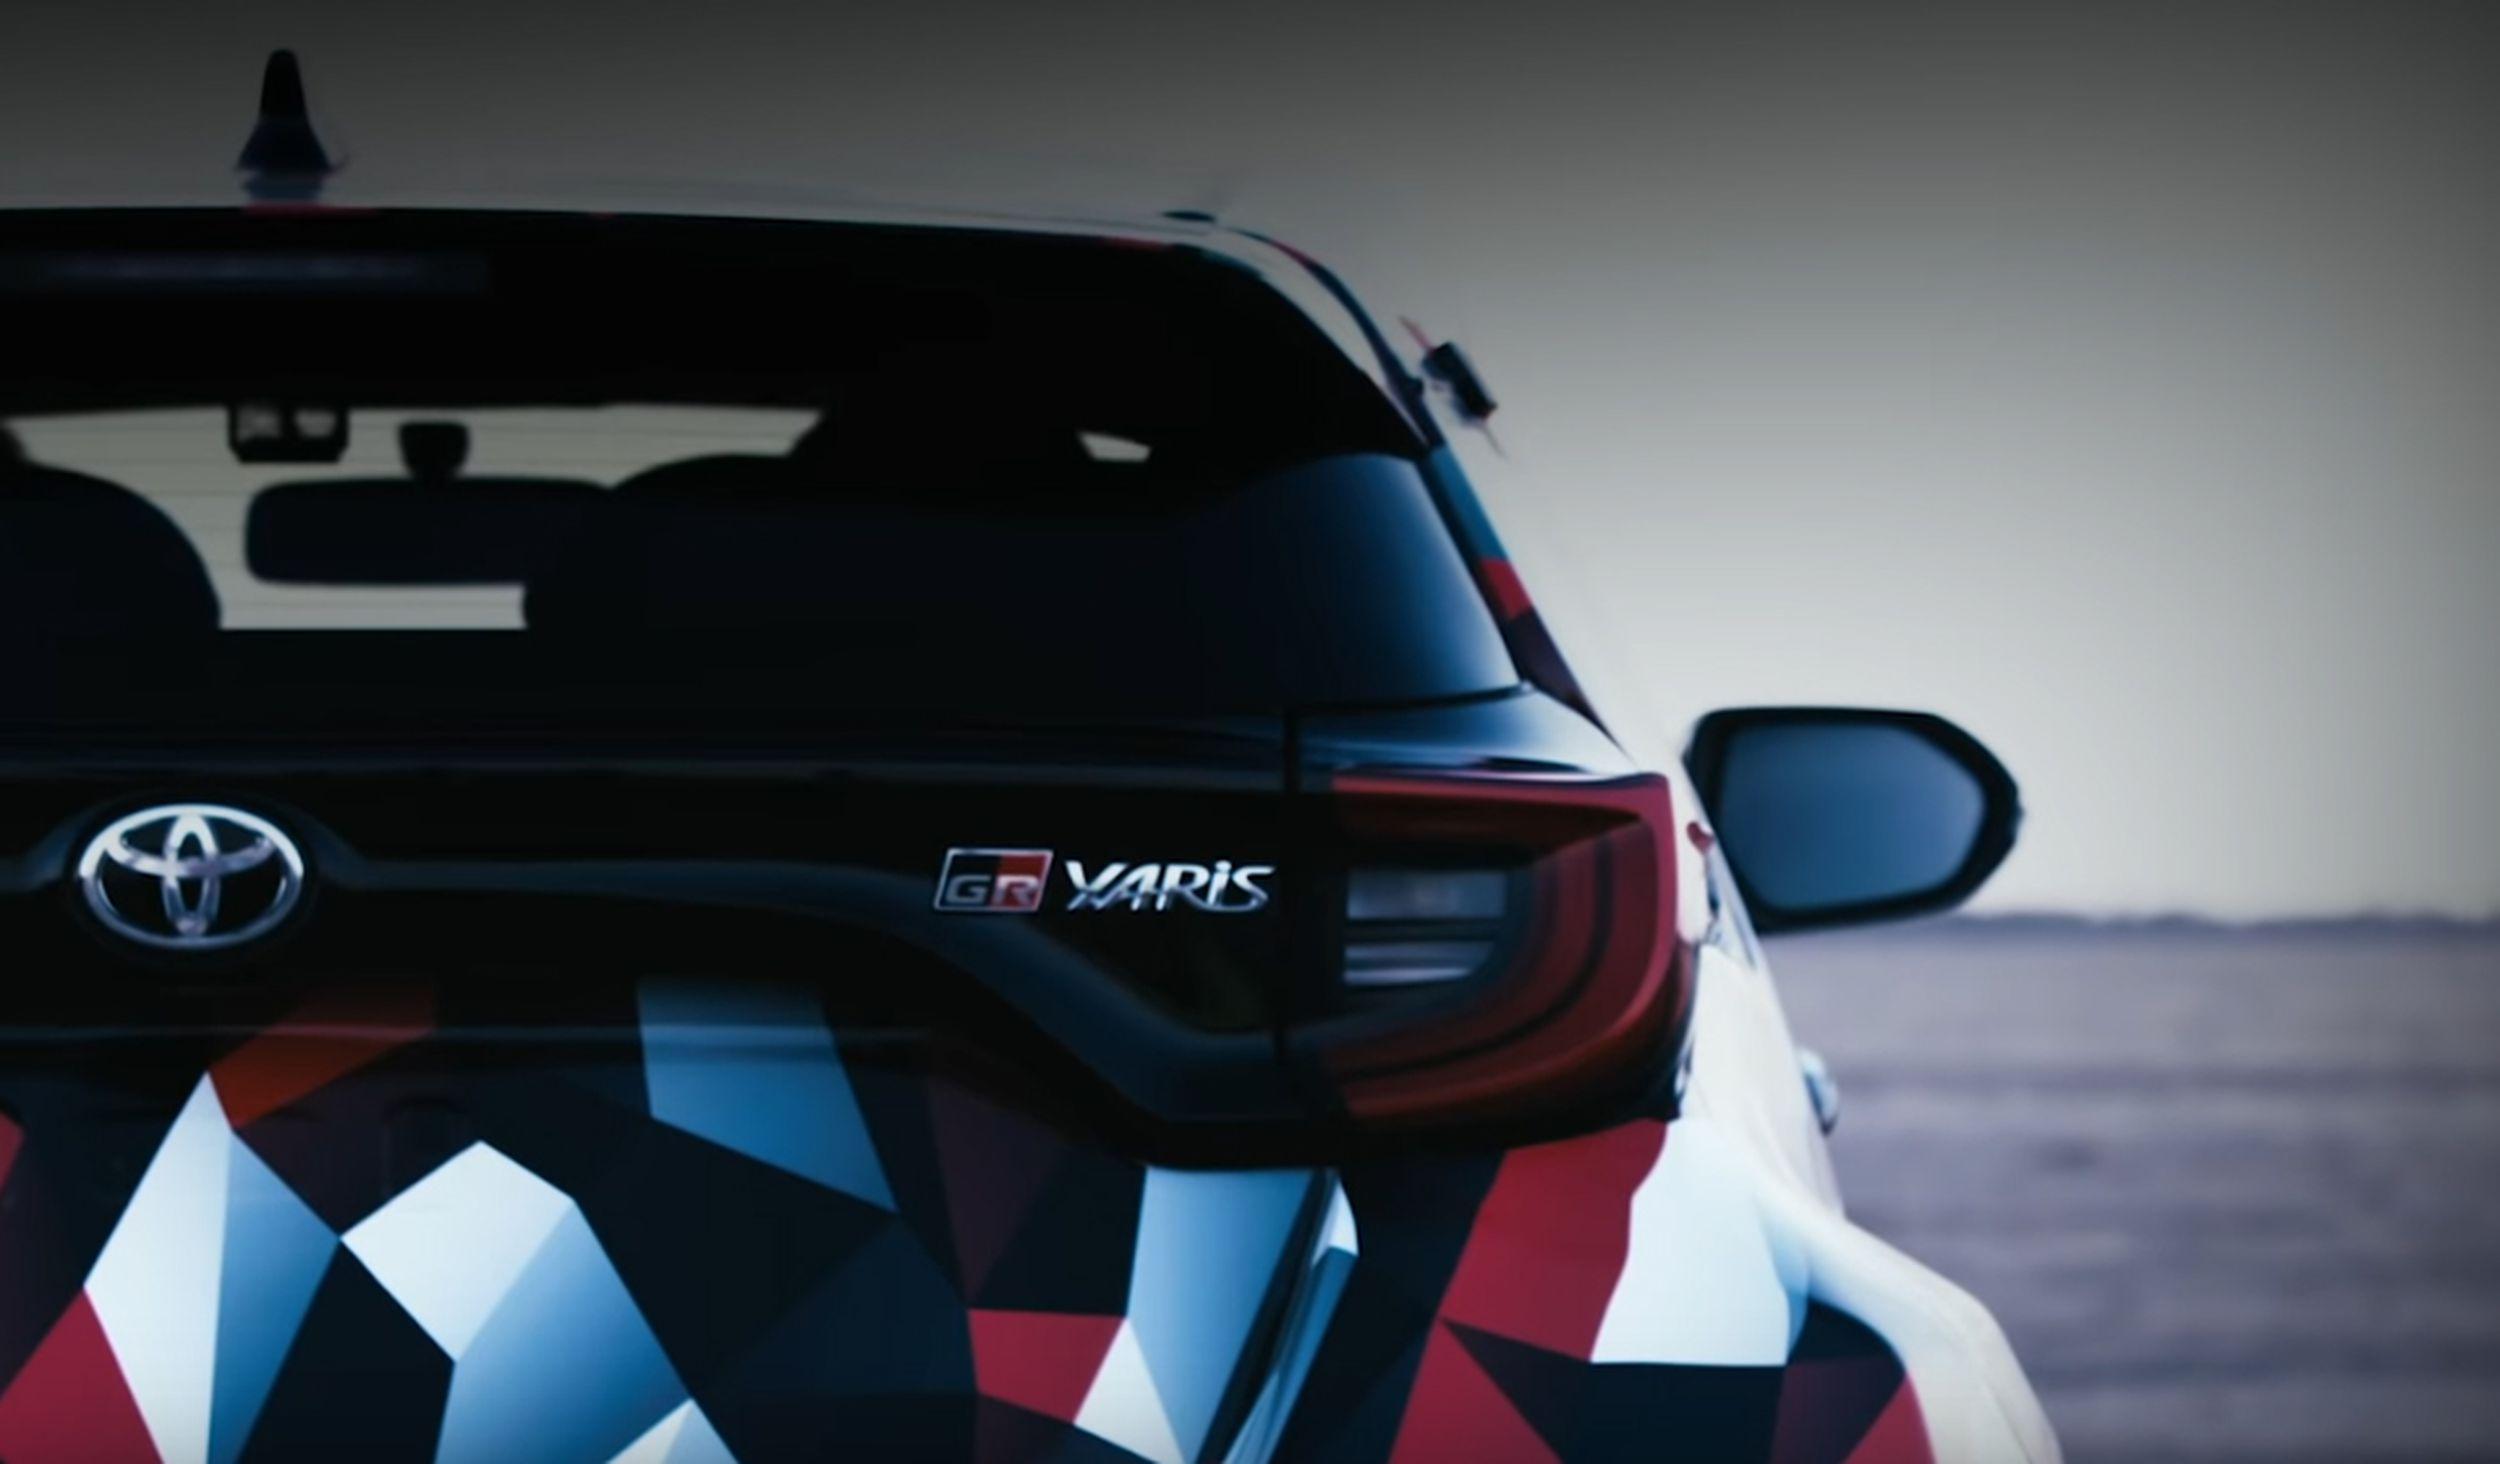 Pompata ed integrale: in arrivo la Toyota Yaris GR-4